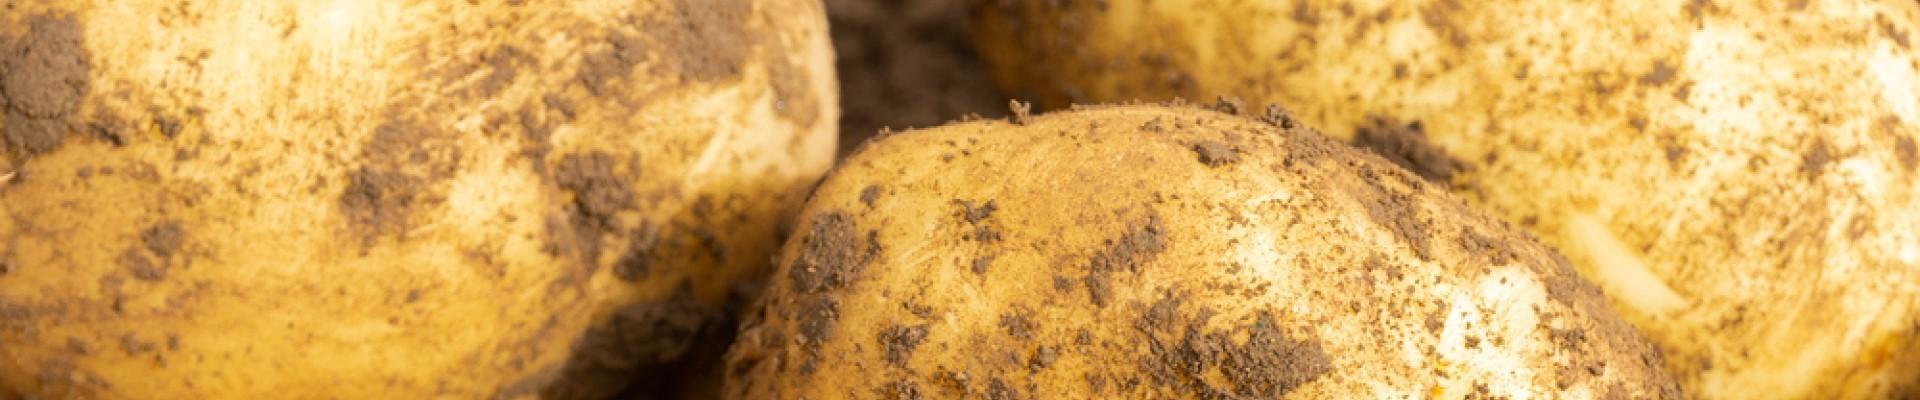 Seed Potatoes & Vegetables